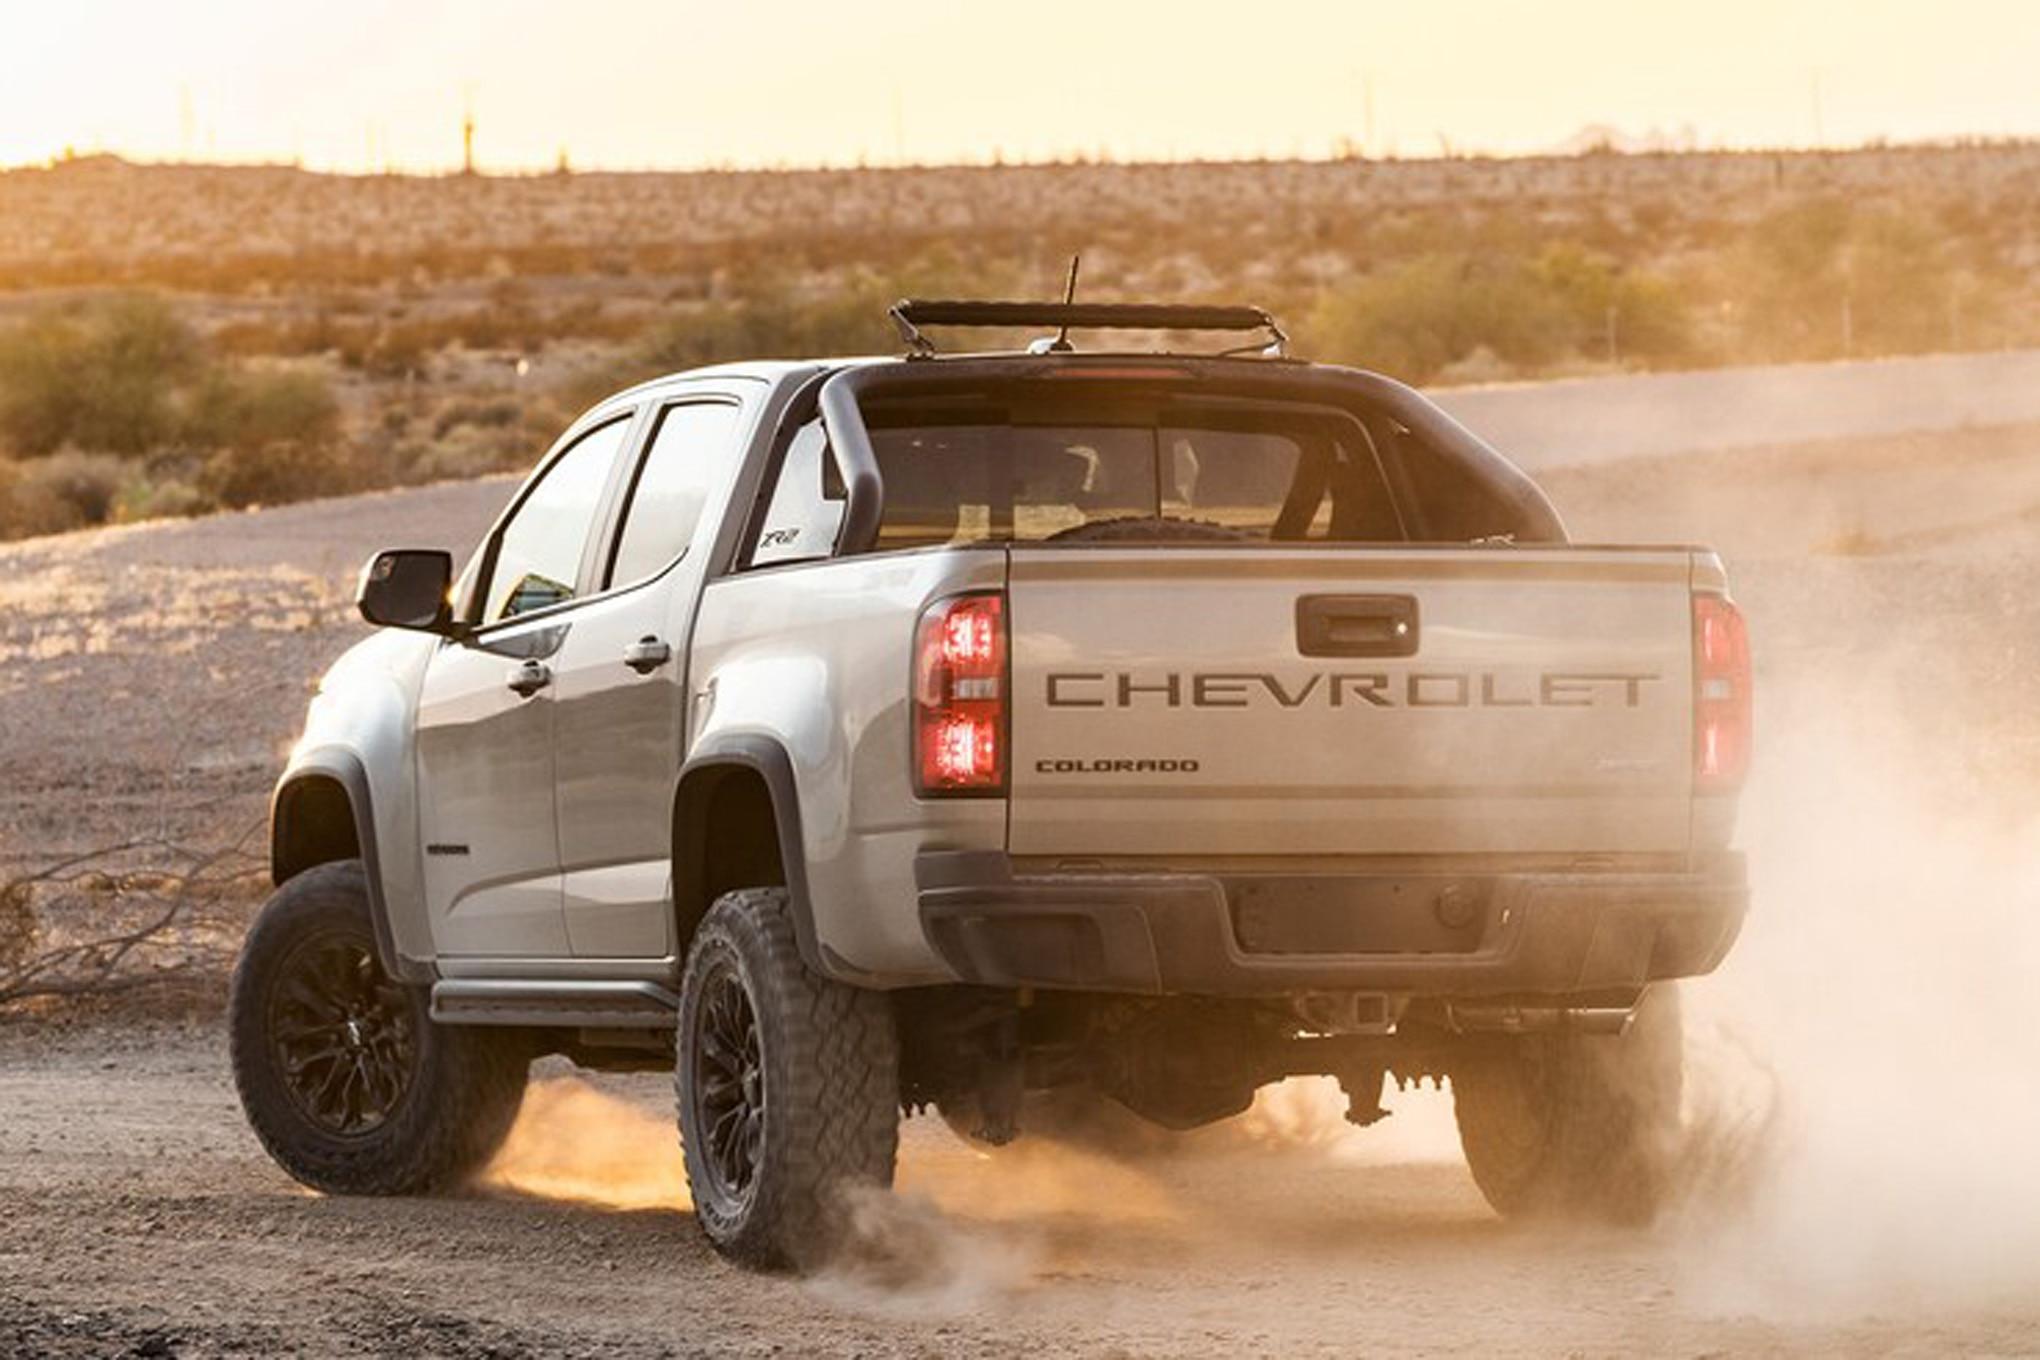 2021 Chevy Colarado Diesel Redesign